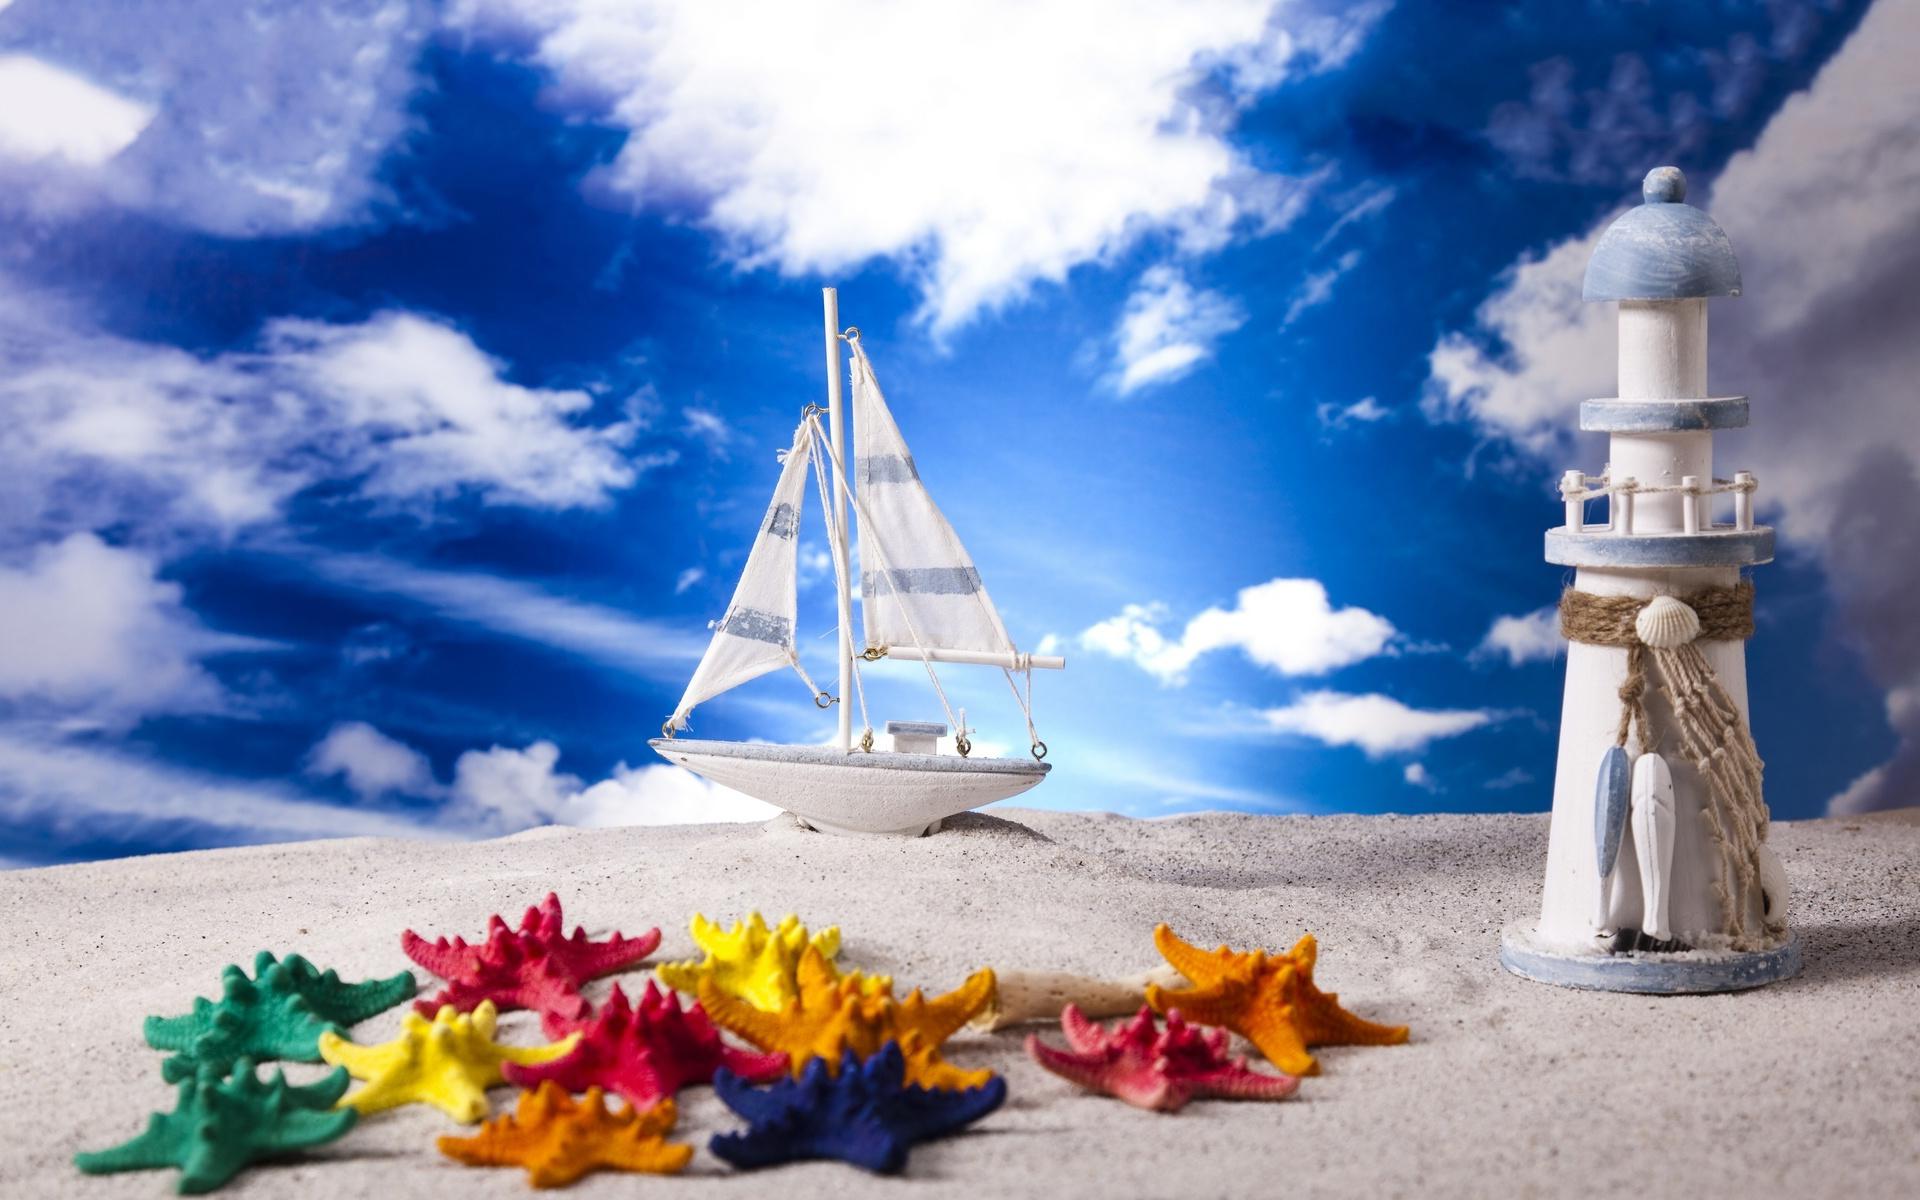 Summer Wallpaper Vacation - HD Desktop Wallpapers